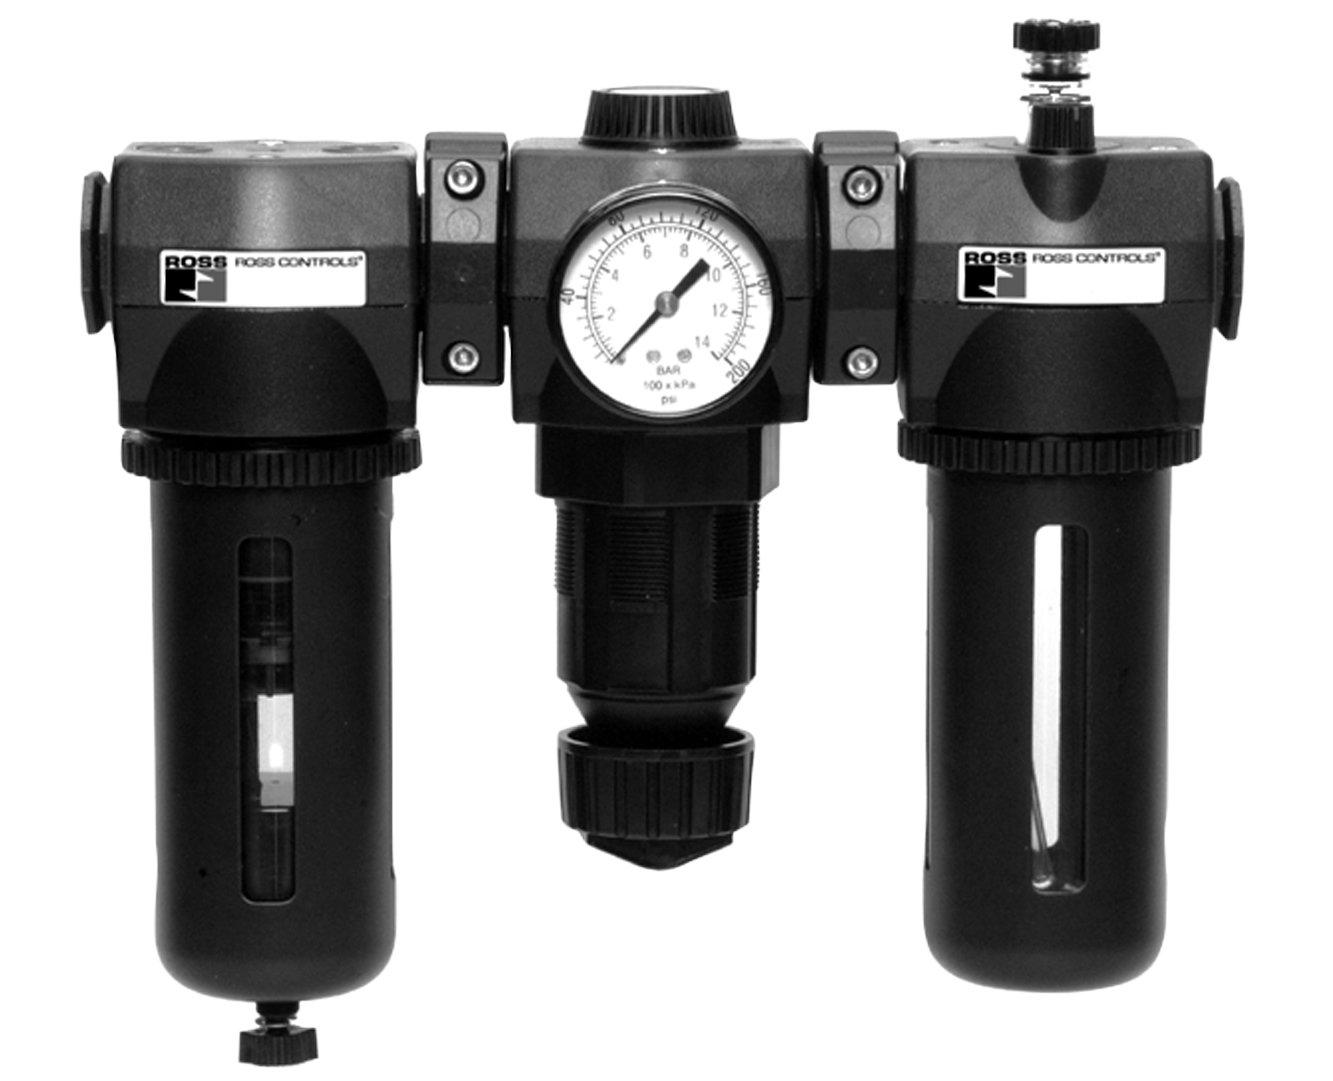 Pressure Range Ross Controls MD453PAA6B32S Regulator plus Lubricator MD4 Series Diaphragm Valve 0-12.1 Gauge Threaded Ports 3//8 NPT Threaded Ports 3//8 NPT 0-200 0-175 psig 0-14 40 /µm Sintered Bronze Filter